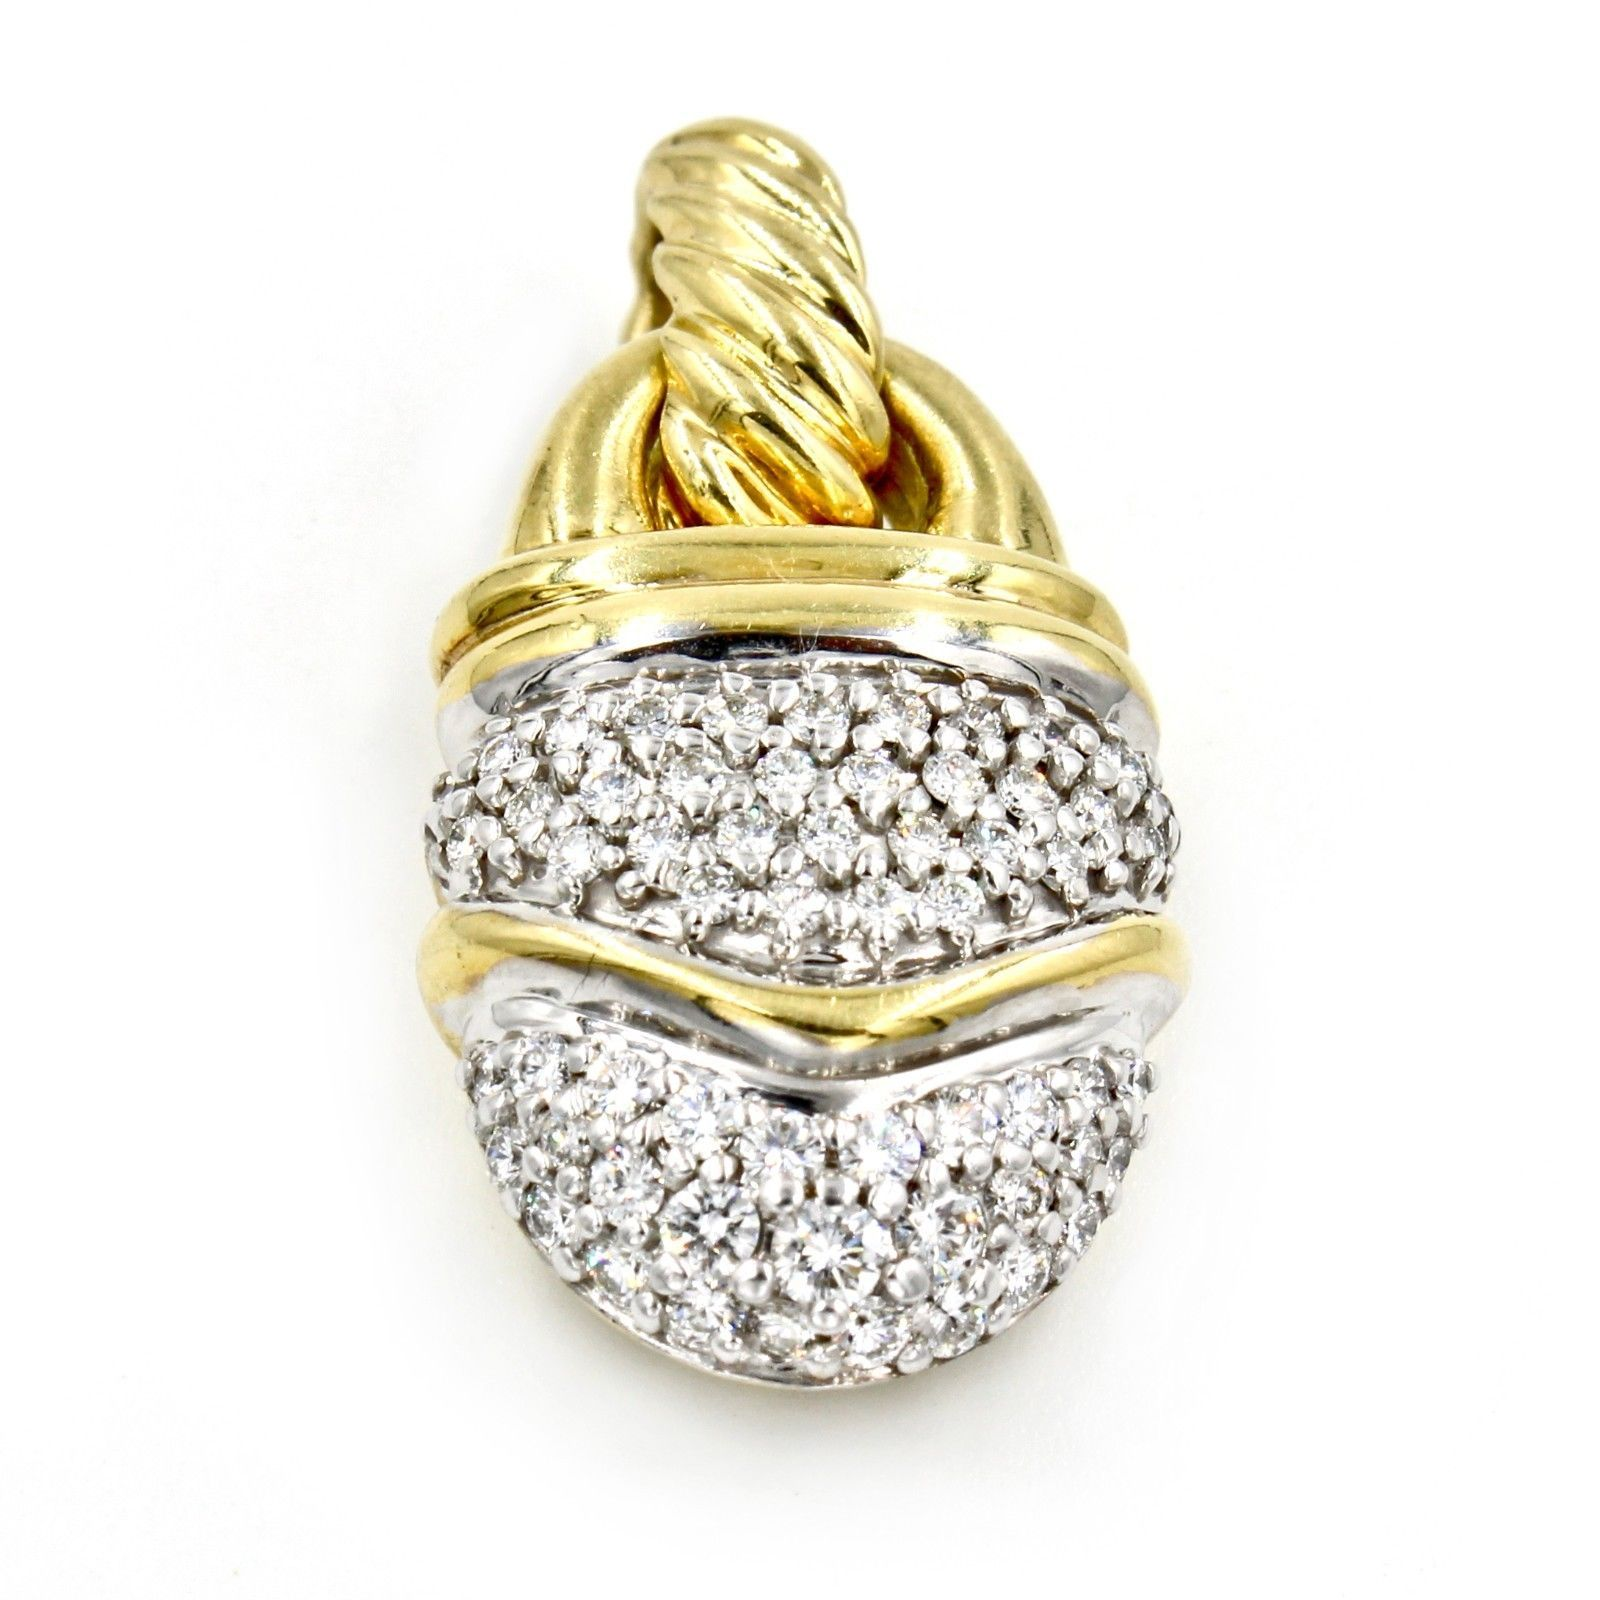 91f206ae0f8e70 57. 57. Previous. David Yurman Cable Classics Pave Diamond 18k Yellow Gold  Acorn Pendant. David Yurman ...